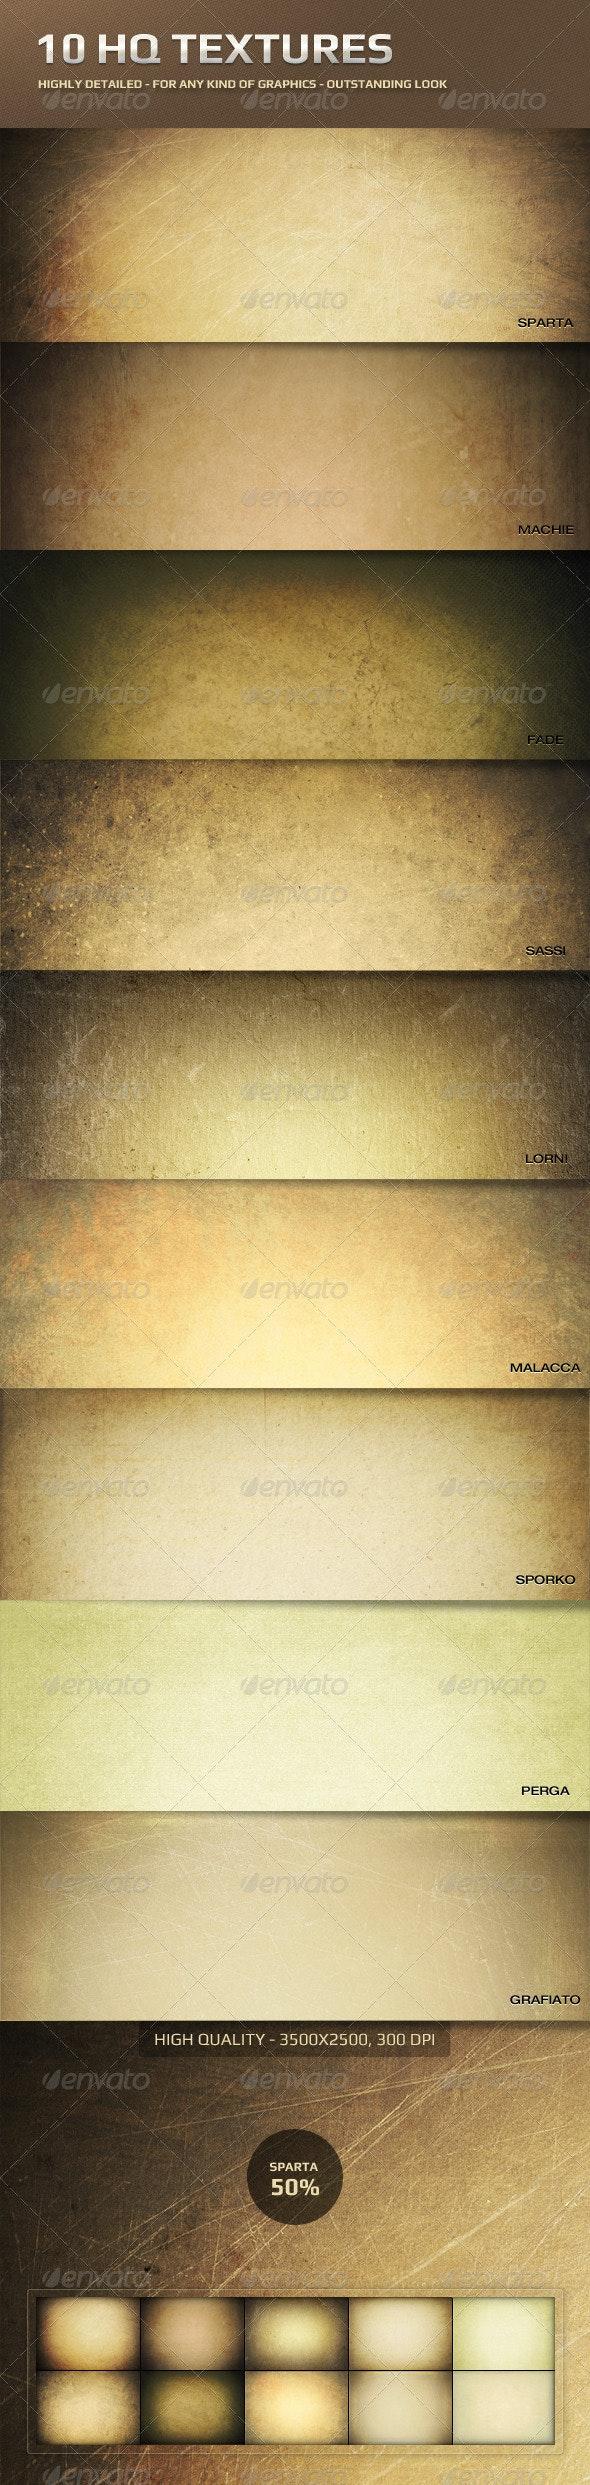 10 HQ Textures - Miscellaneous Textures